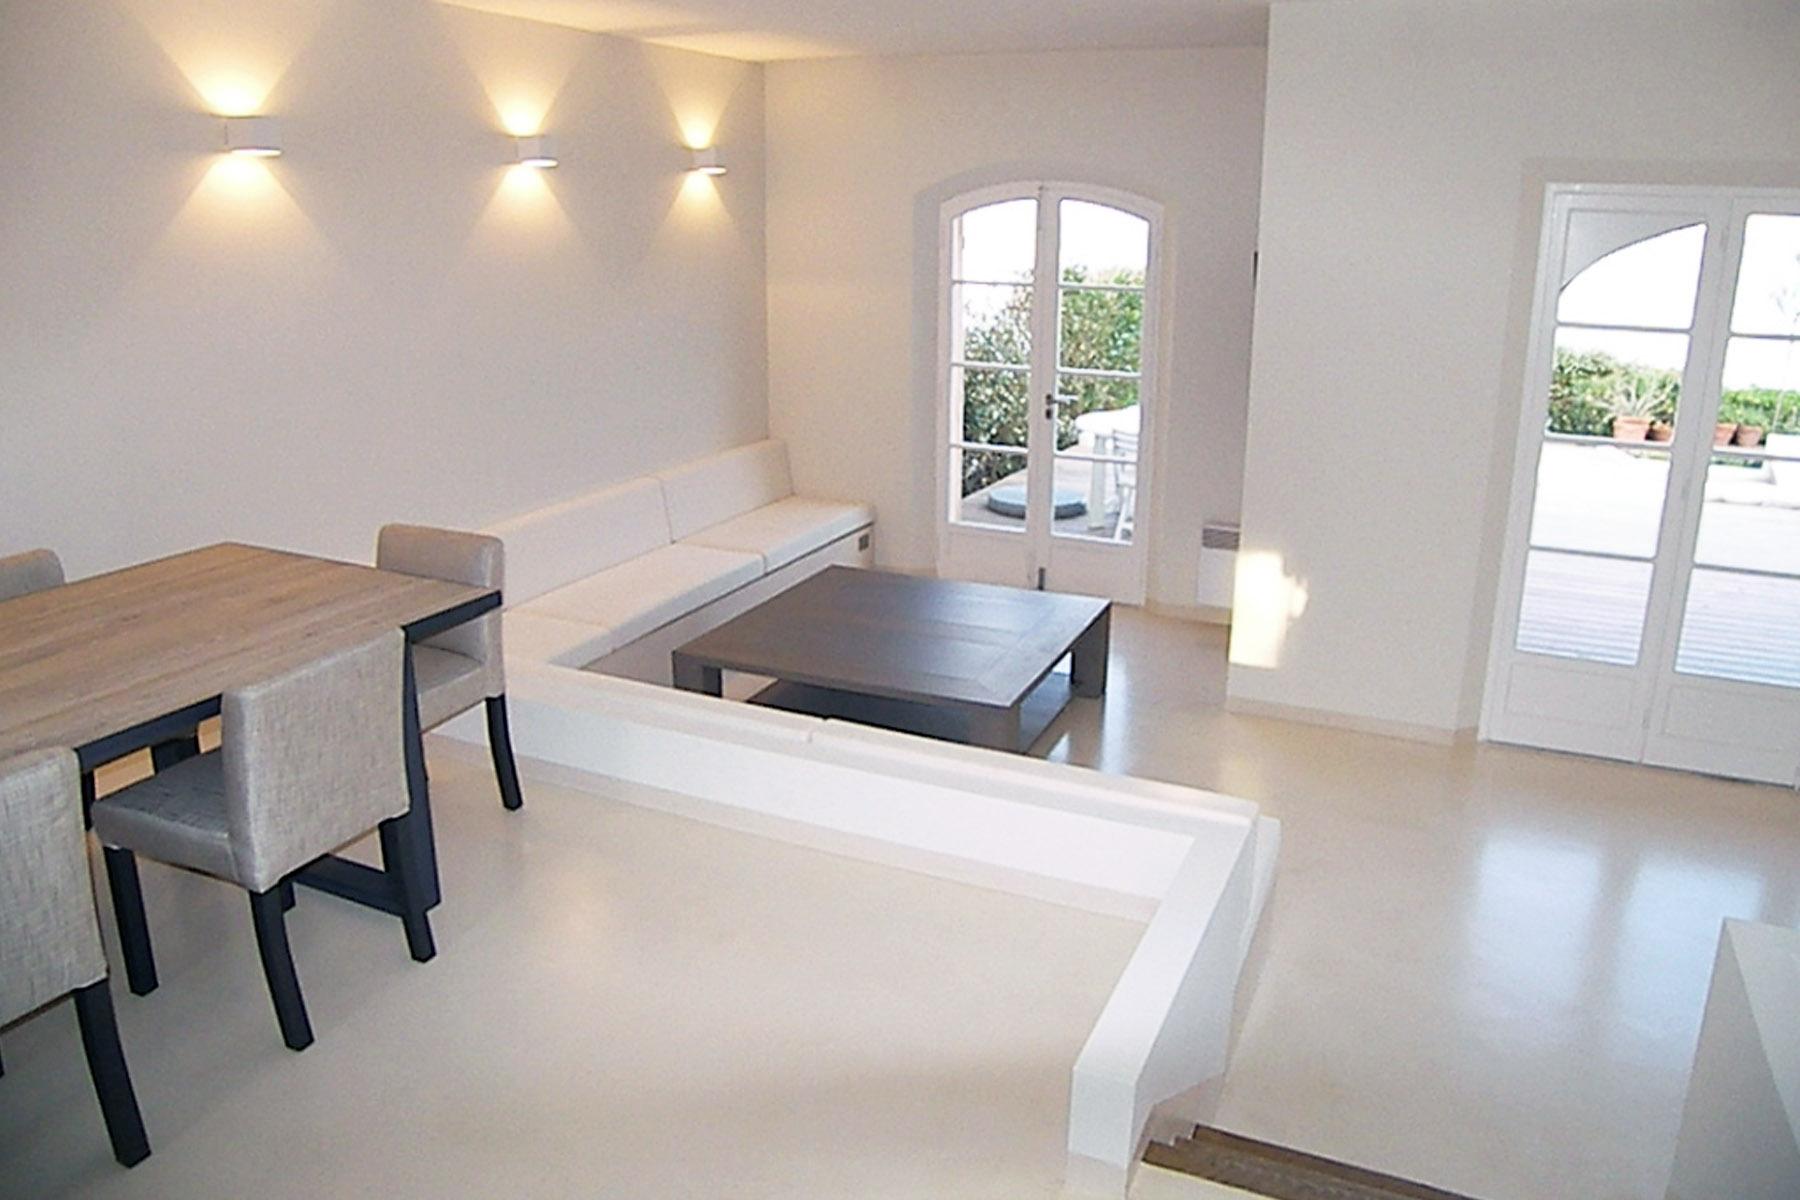 L2-Florence_Watine_Architecte_Designer_Decoratrice_Paris_France-2